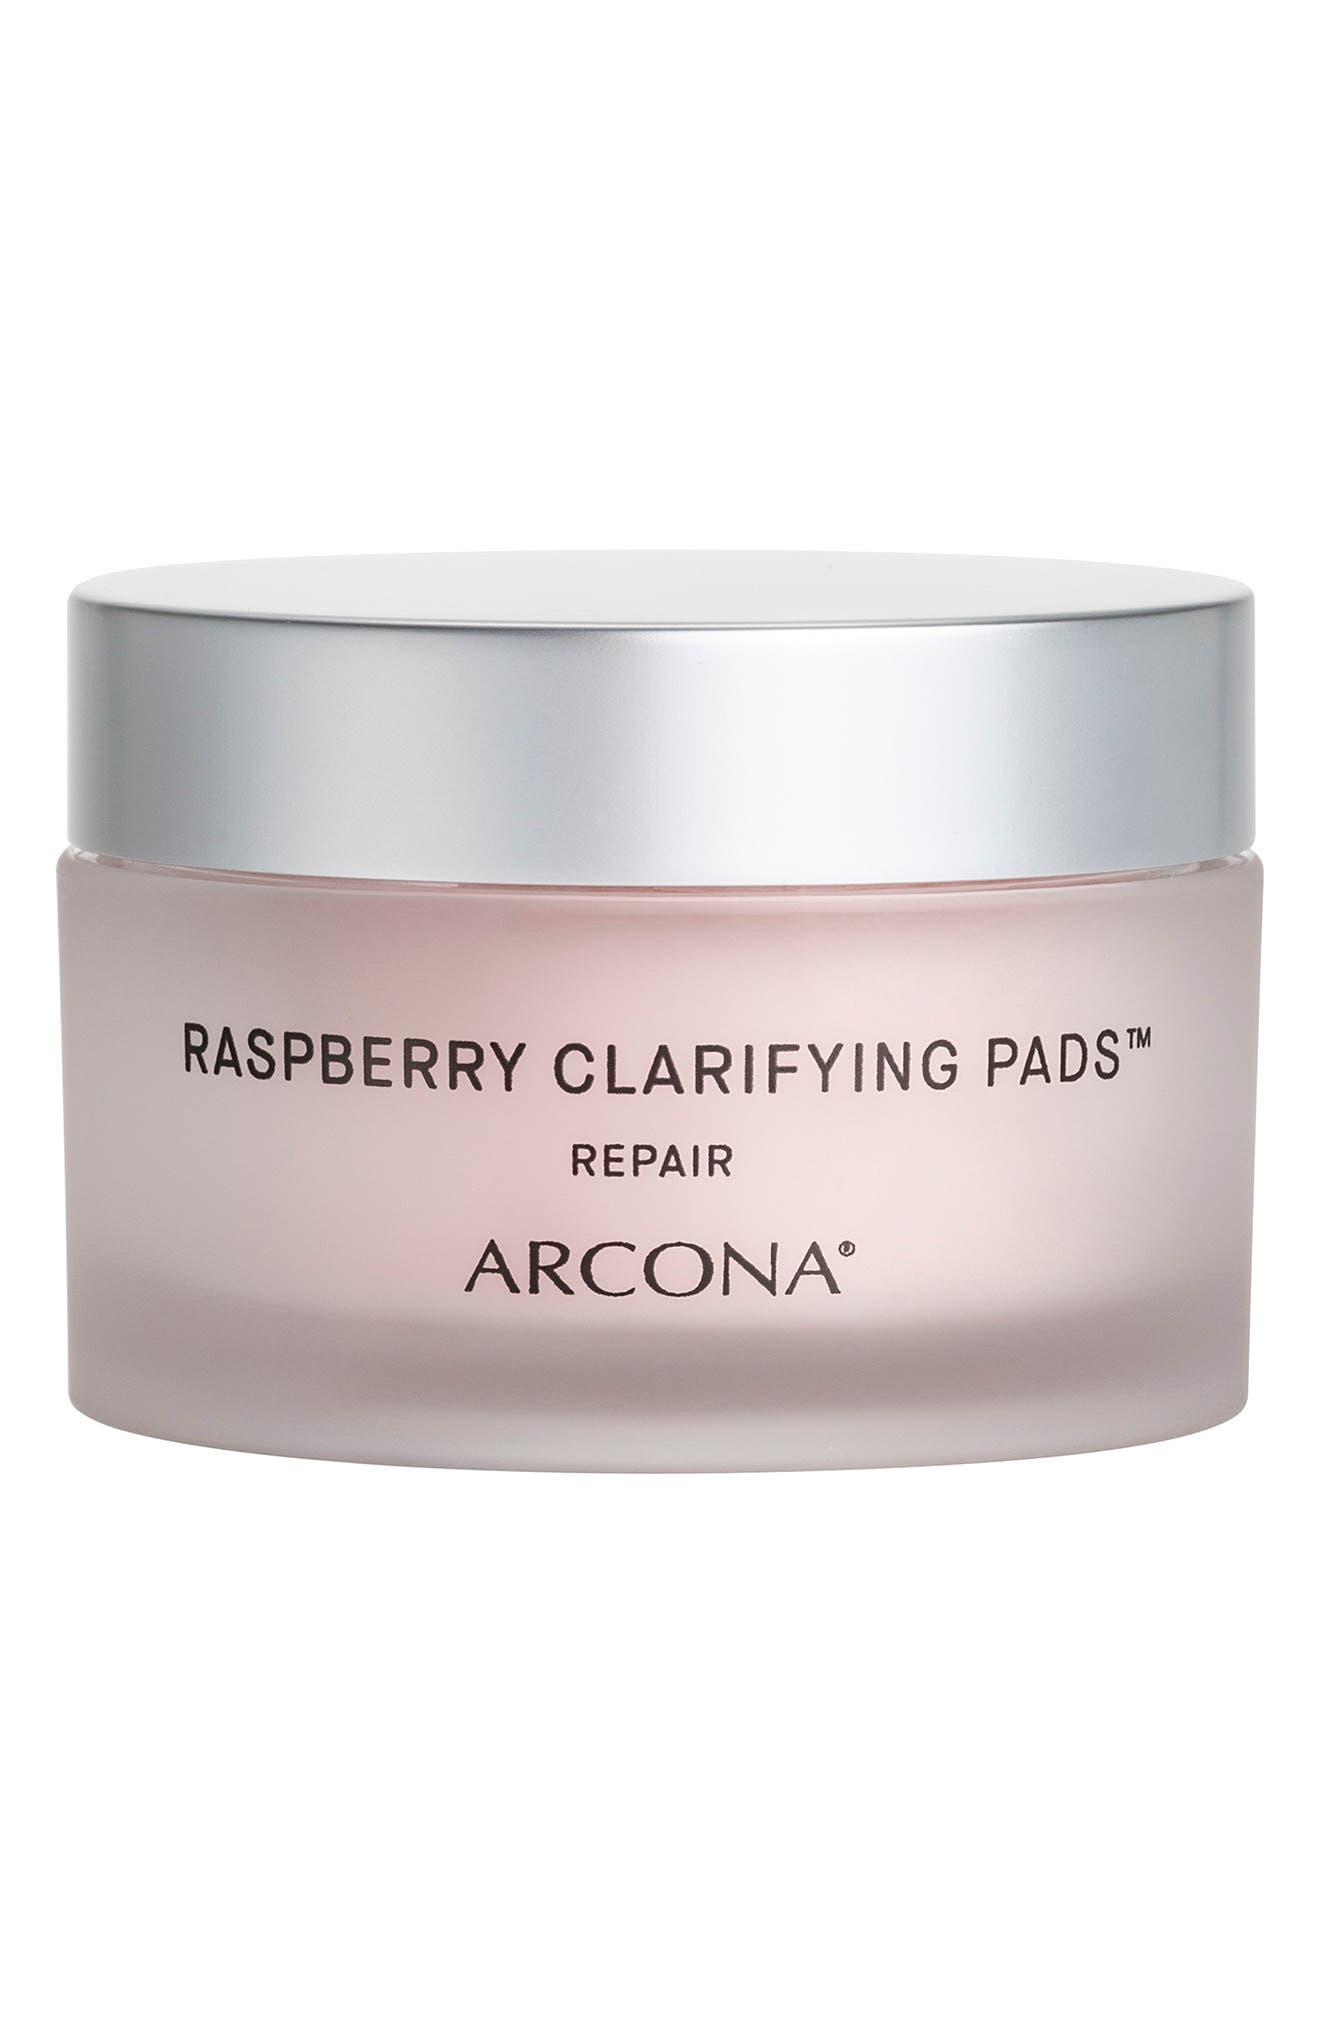 Raspberry Clarifying Pads Blemish Reducing Face Toner Pads